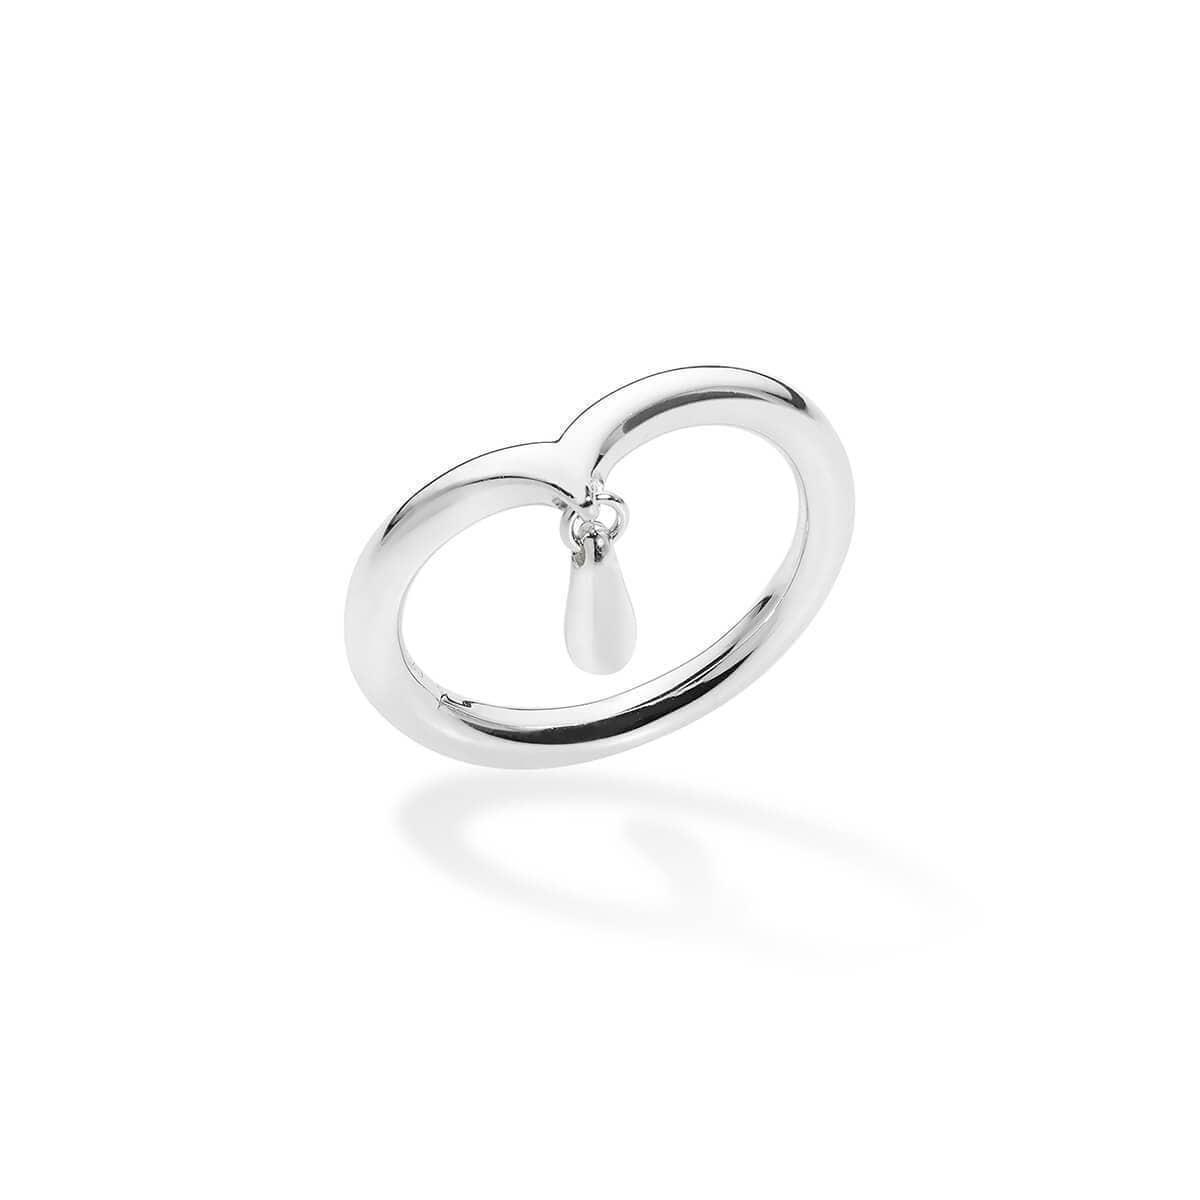 Midi Ring With Drop